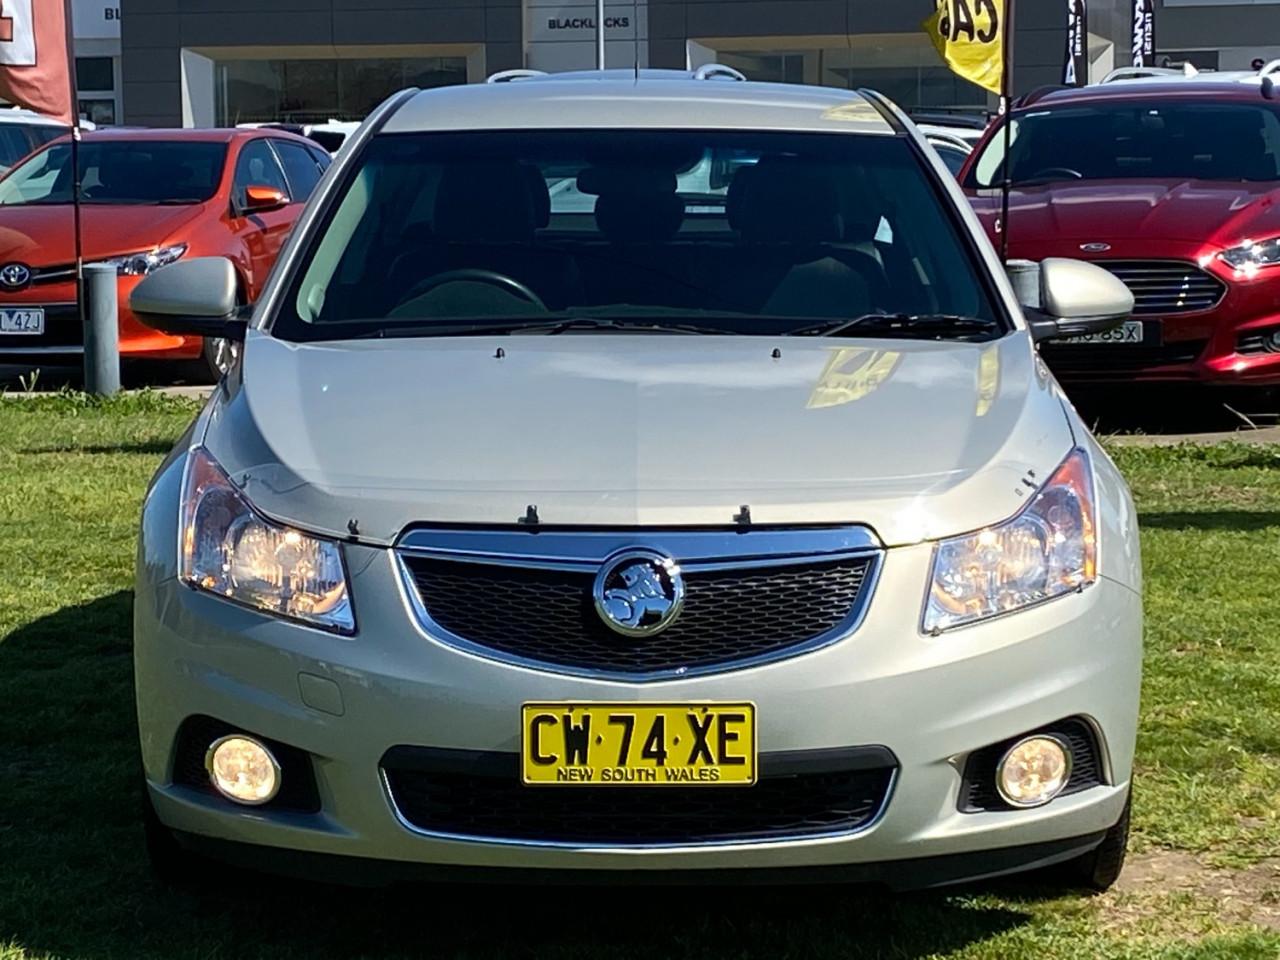 2012 Holden Cruze JH SERIES II MY12 CDX Hatchback Image 14